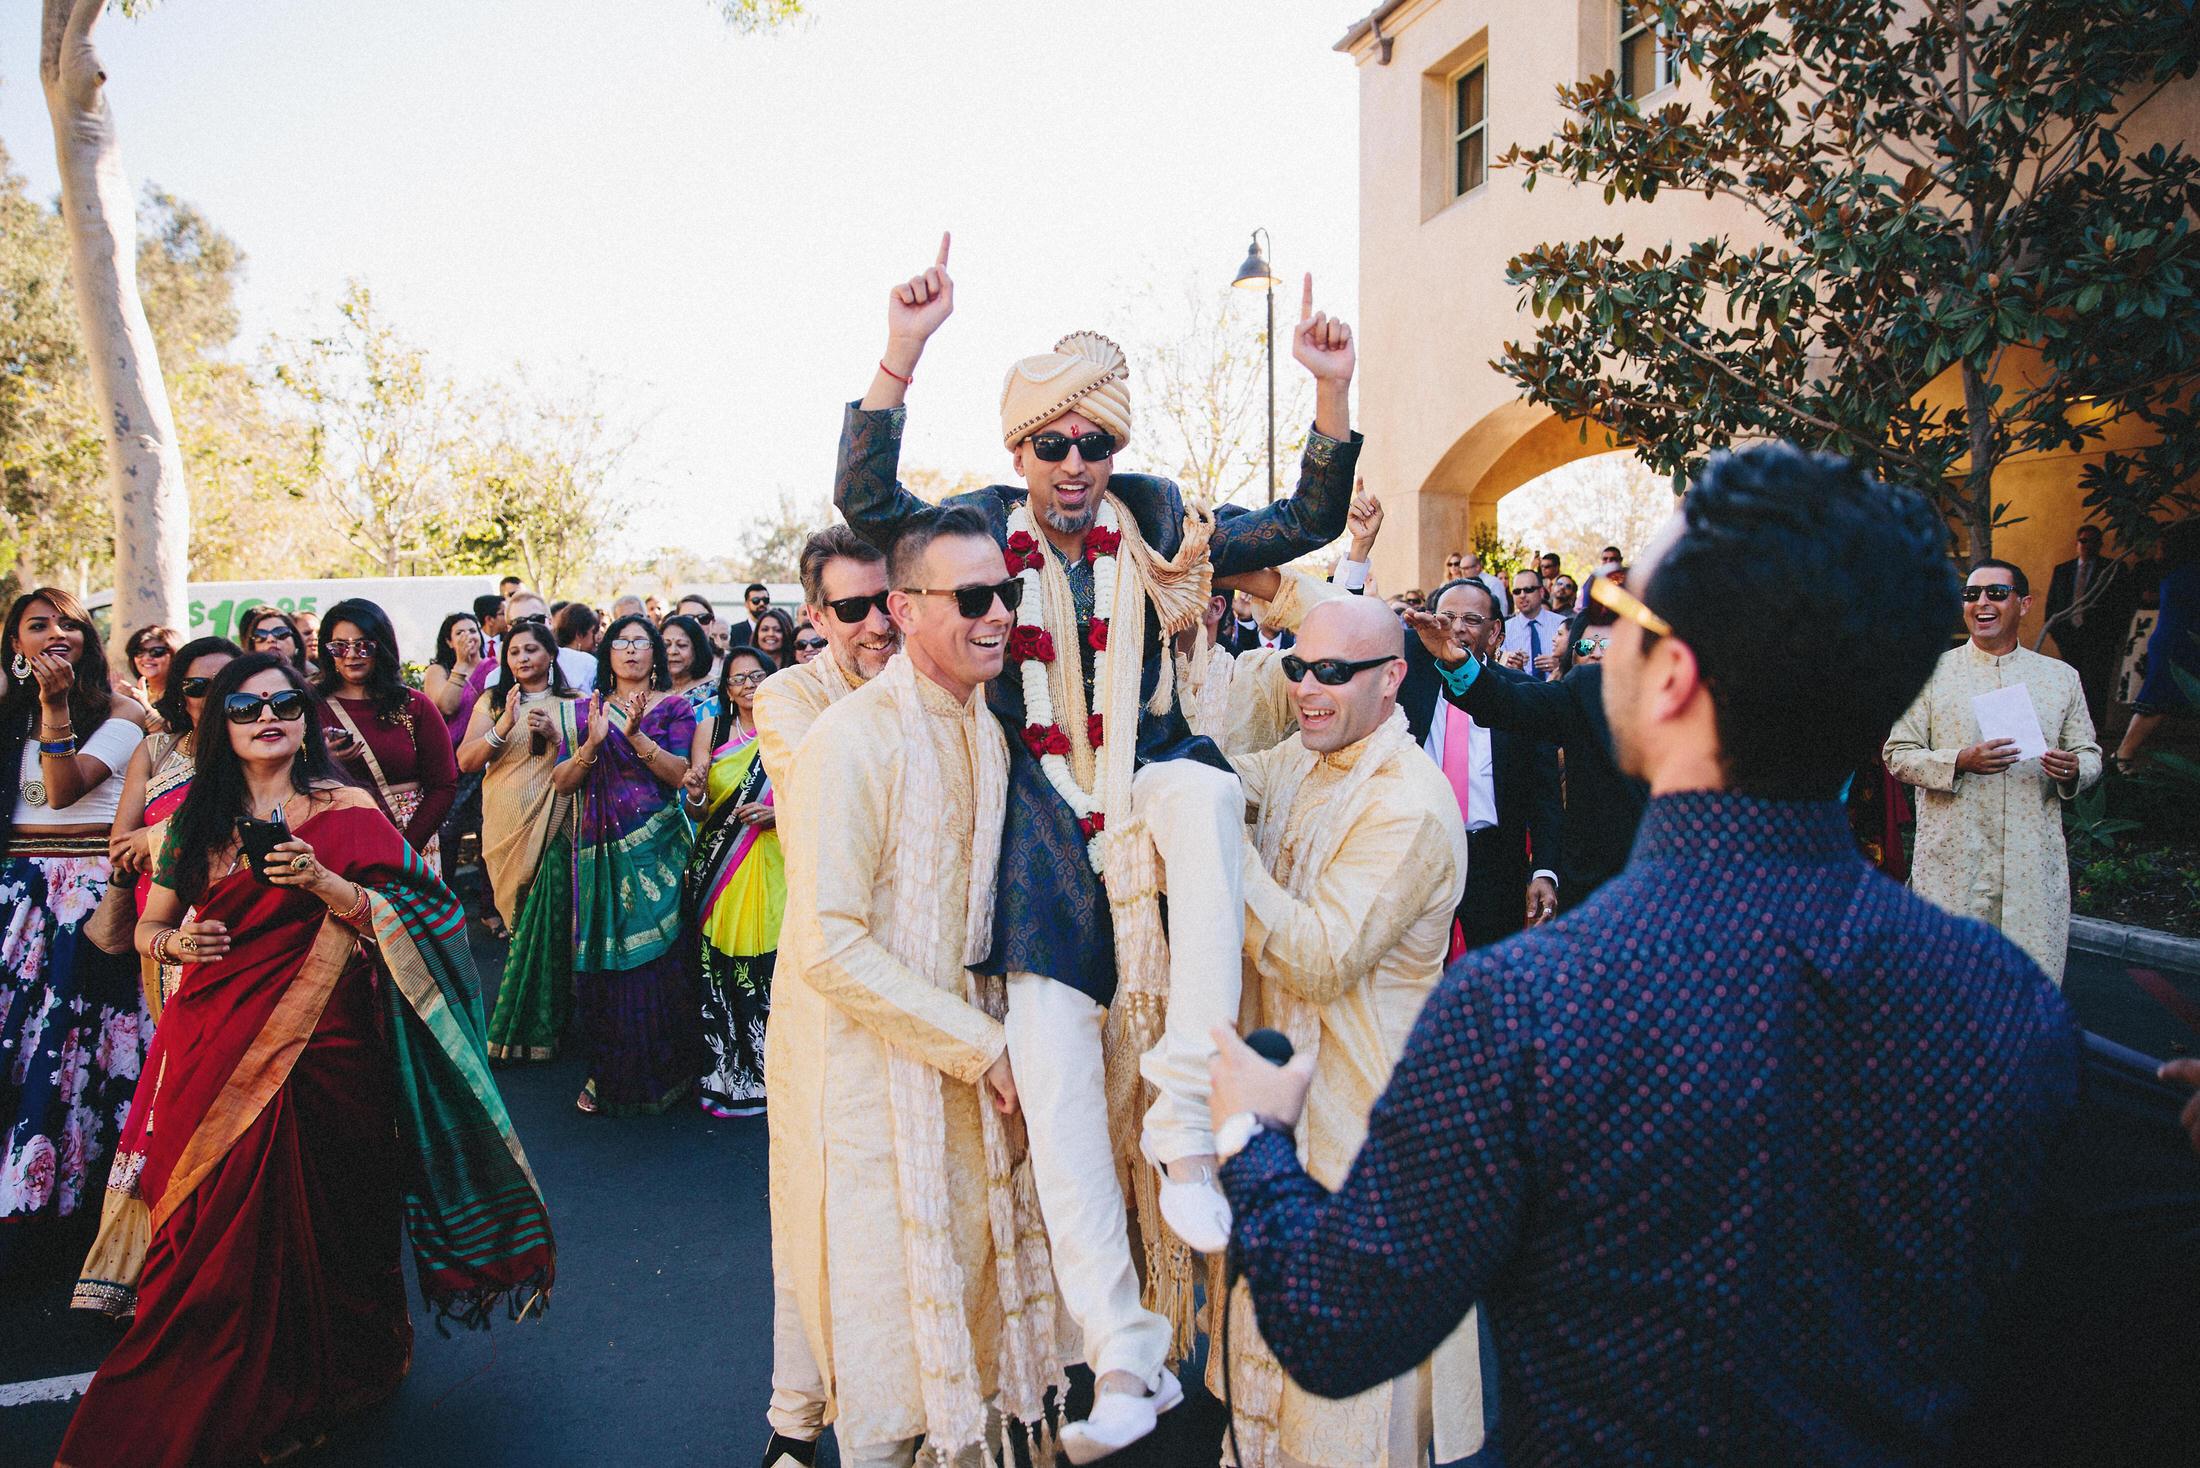 Modern-Indian-Serra-Plaza-wedding-042.jpg